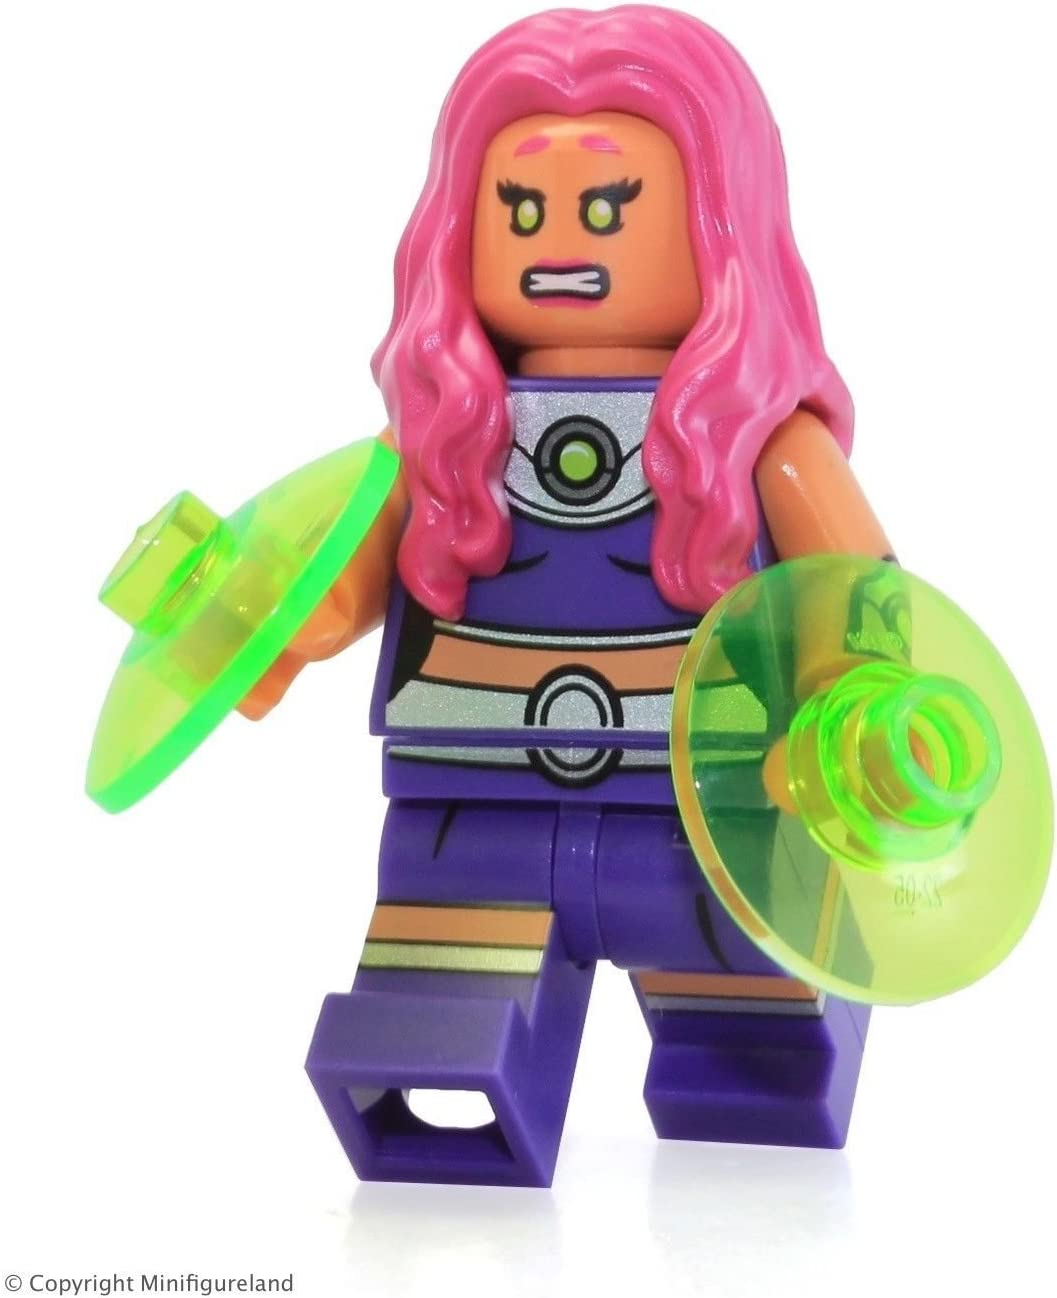 LEGO Super Heroes DC Universe Batman Minifigure - Starfire from Jokerland (76035)